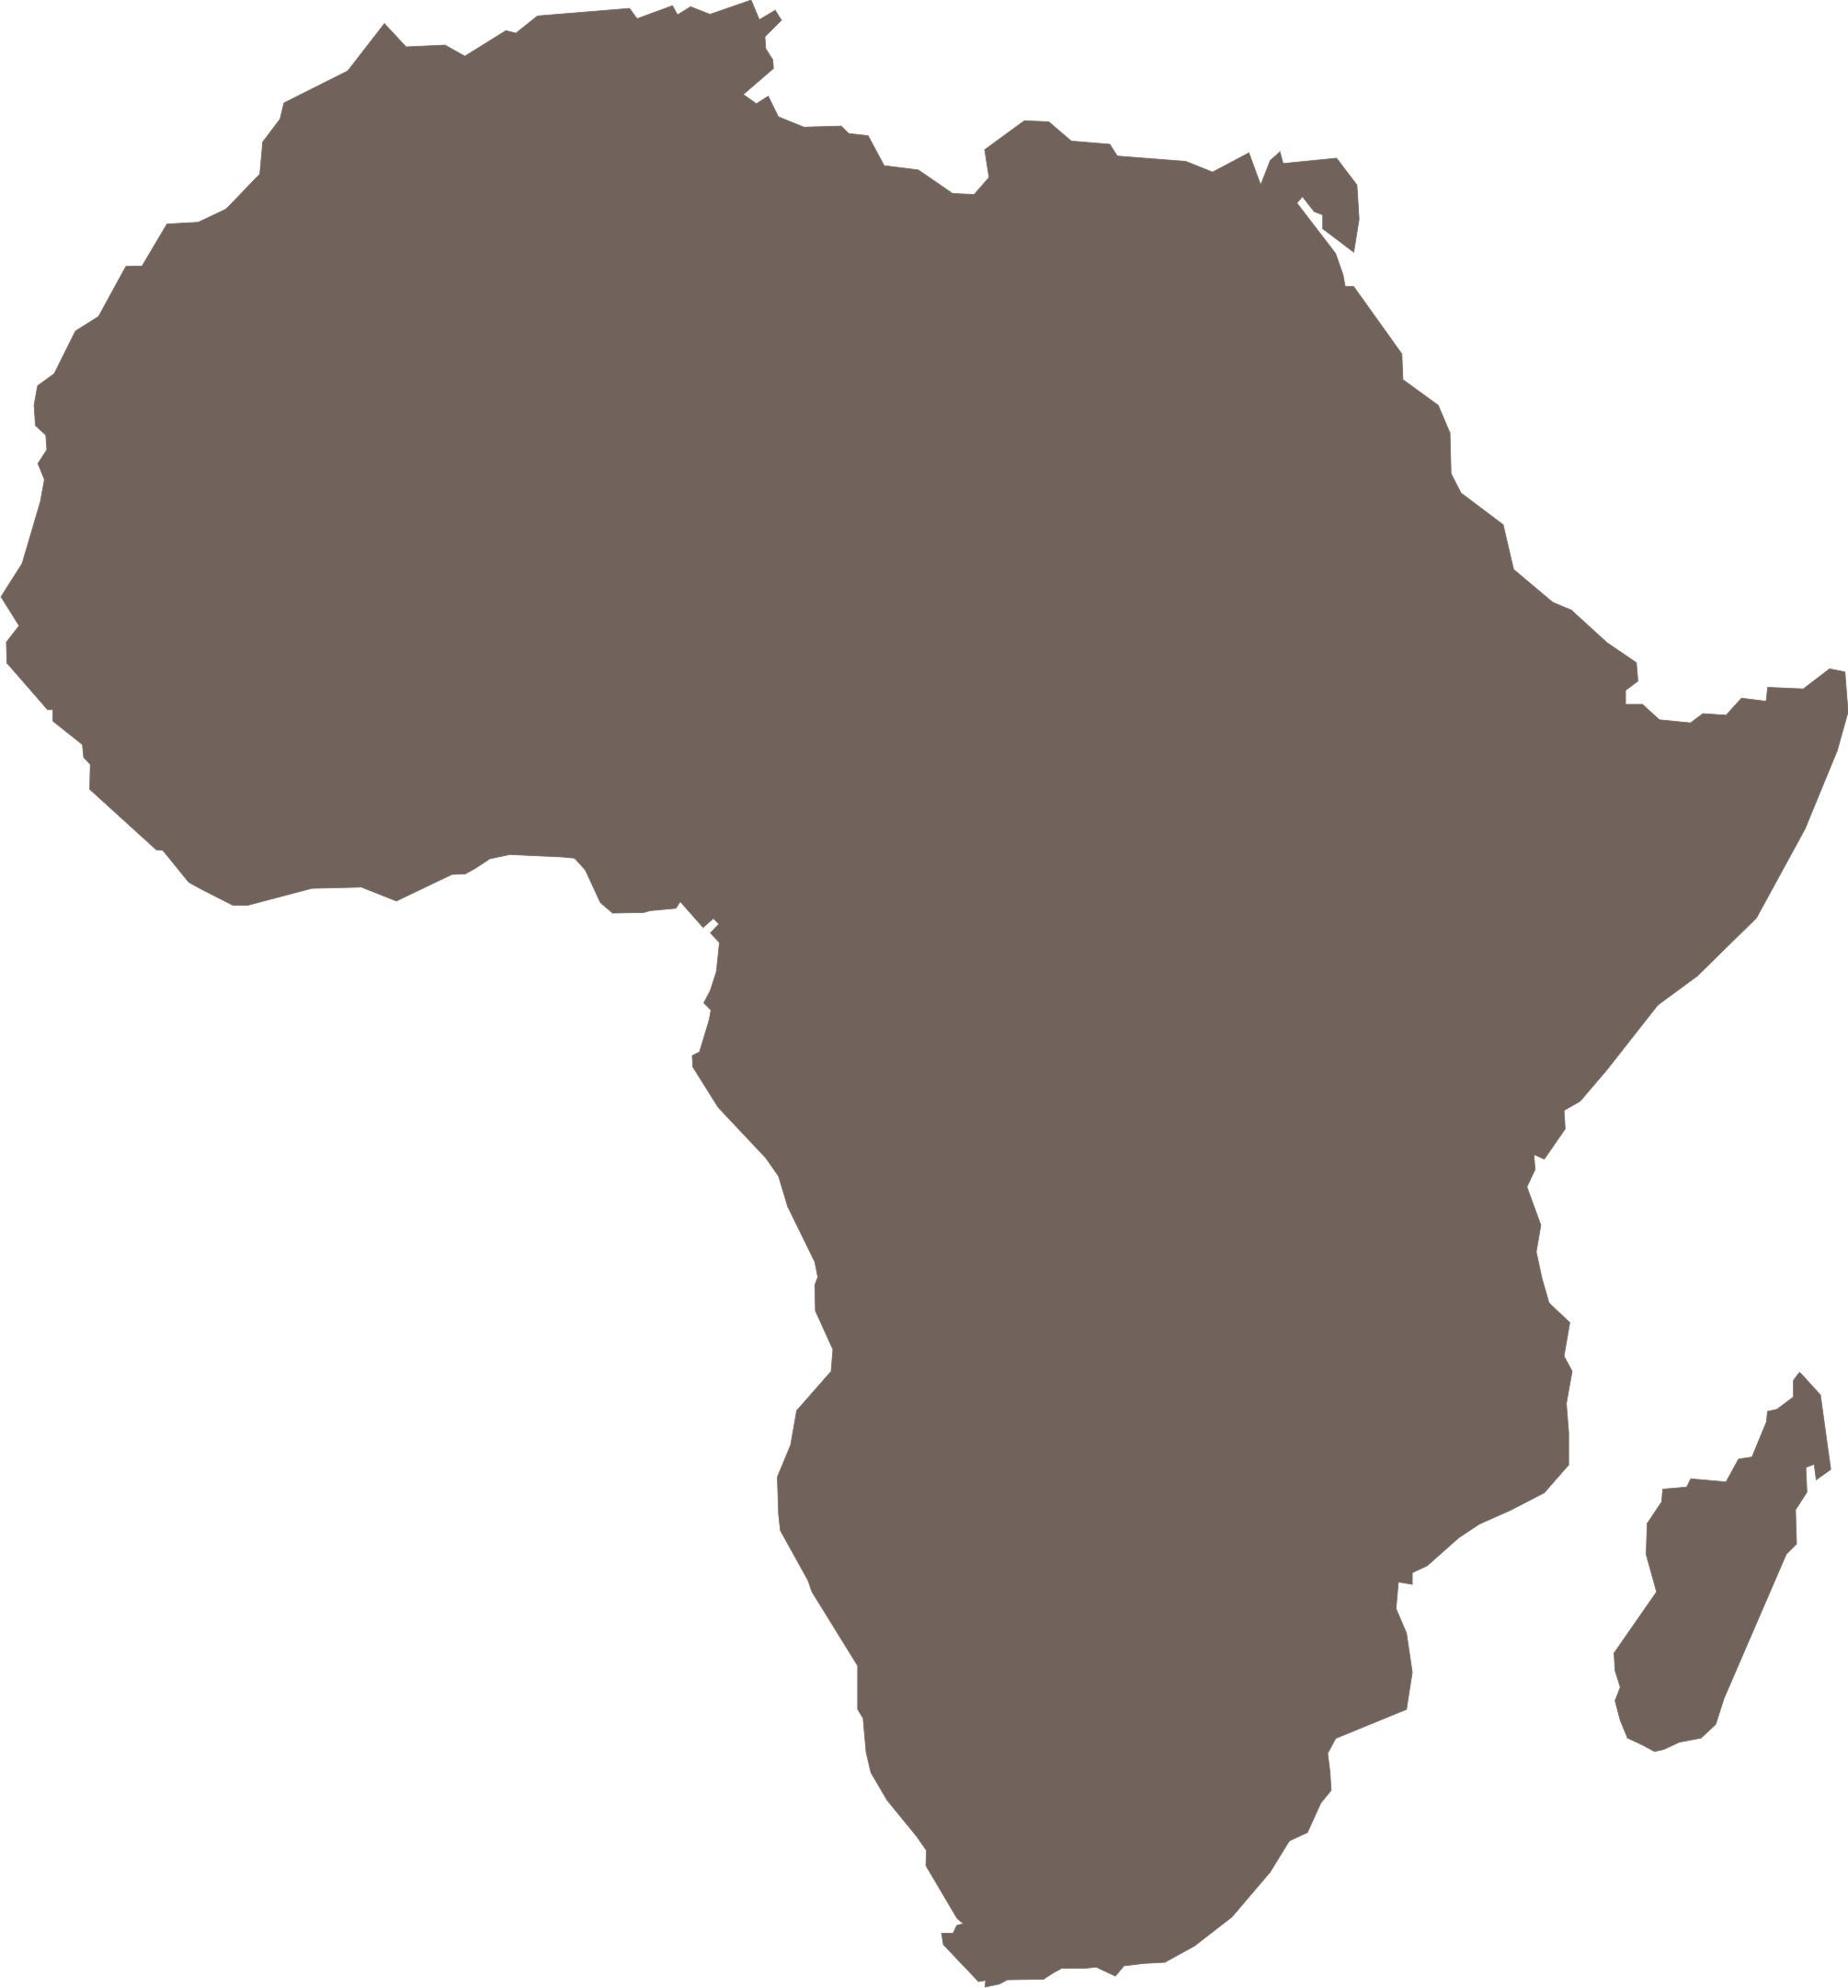 http://img09.deviantart.net/7c48/i/2009/146/d/c/africa_map_by_markhal.jpg